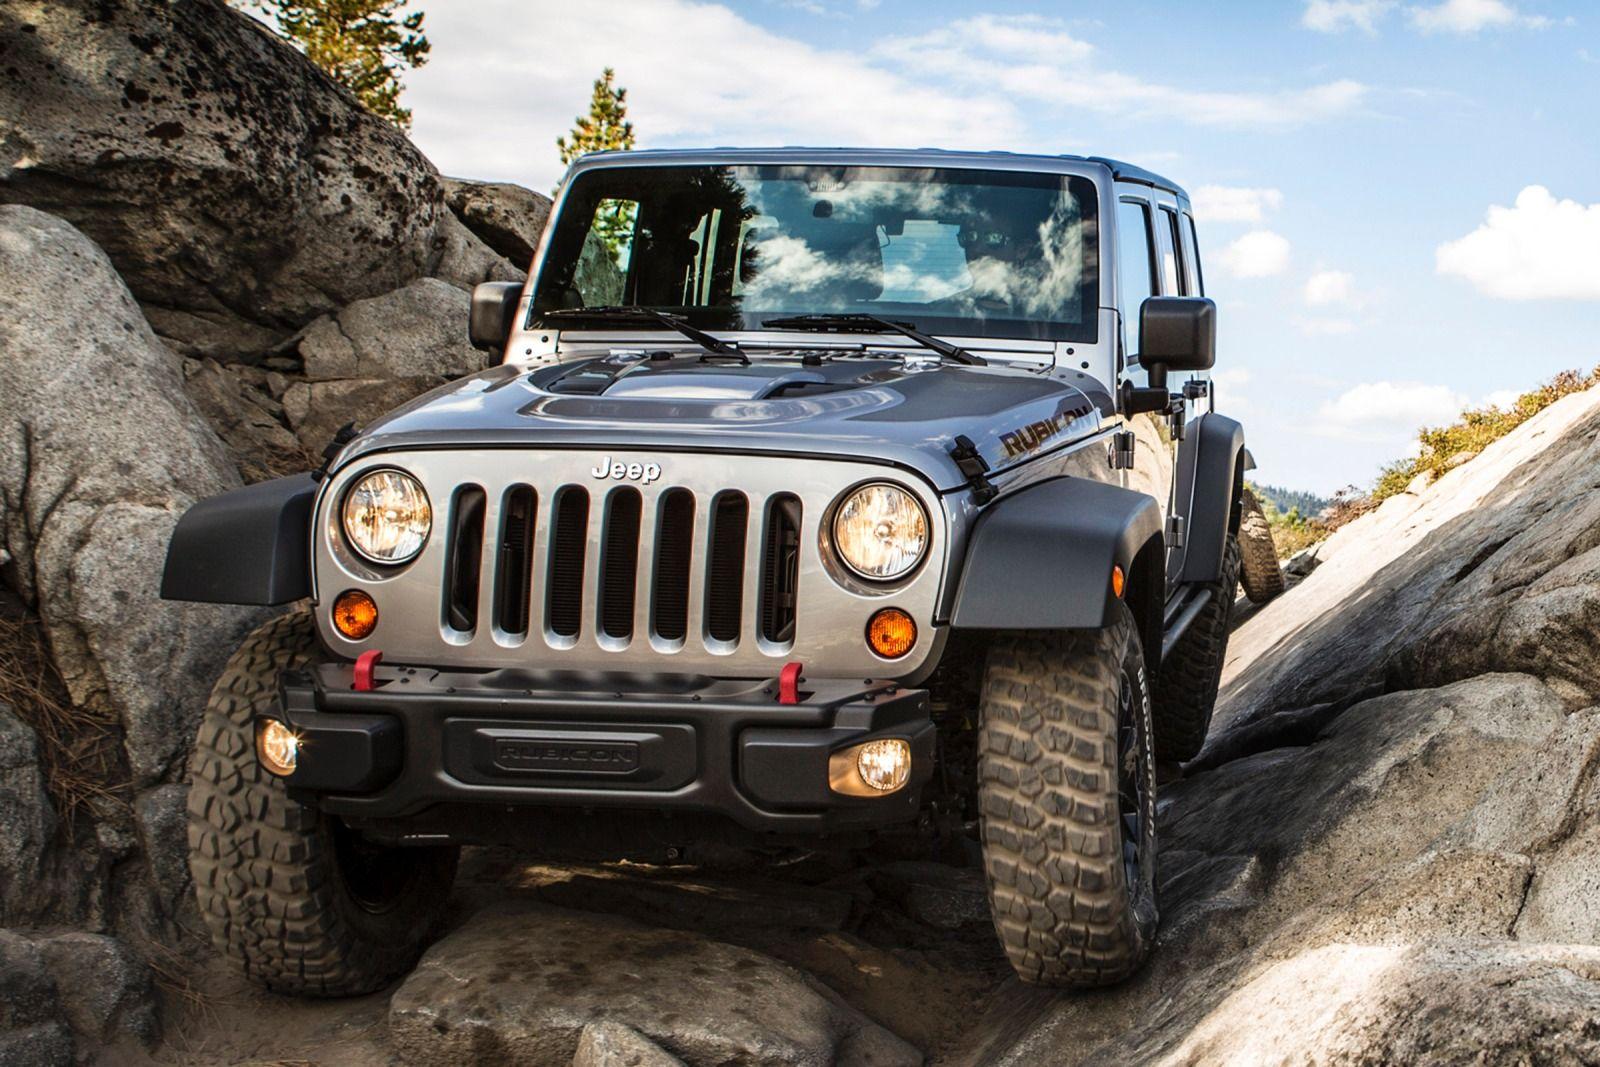 2015 Jeep Wrangler - Offroading